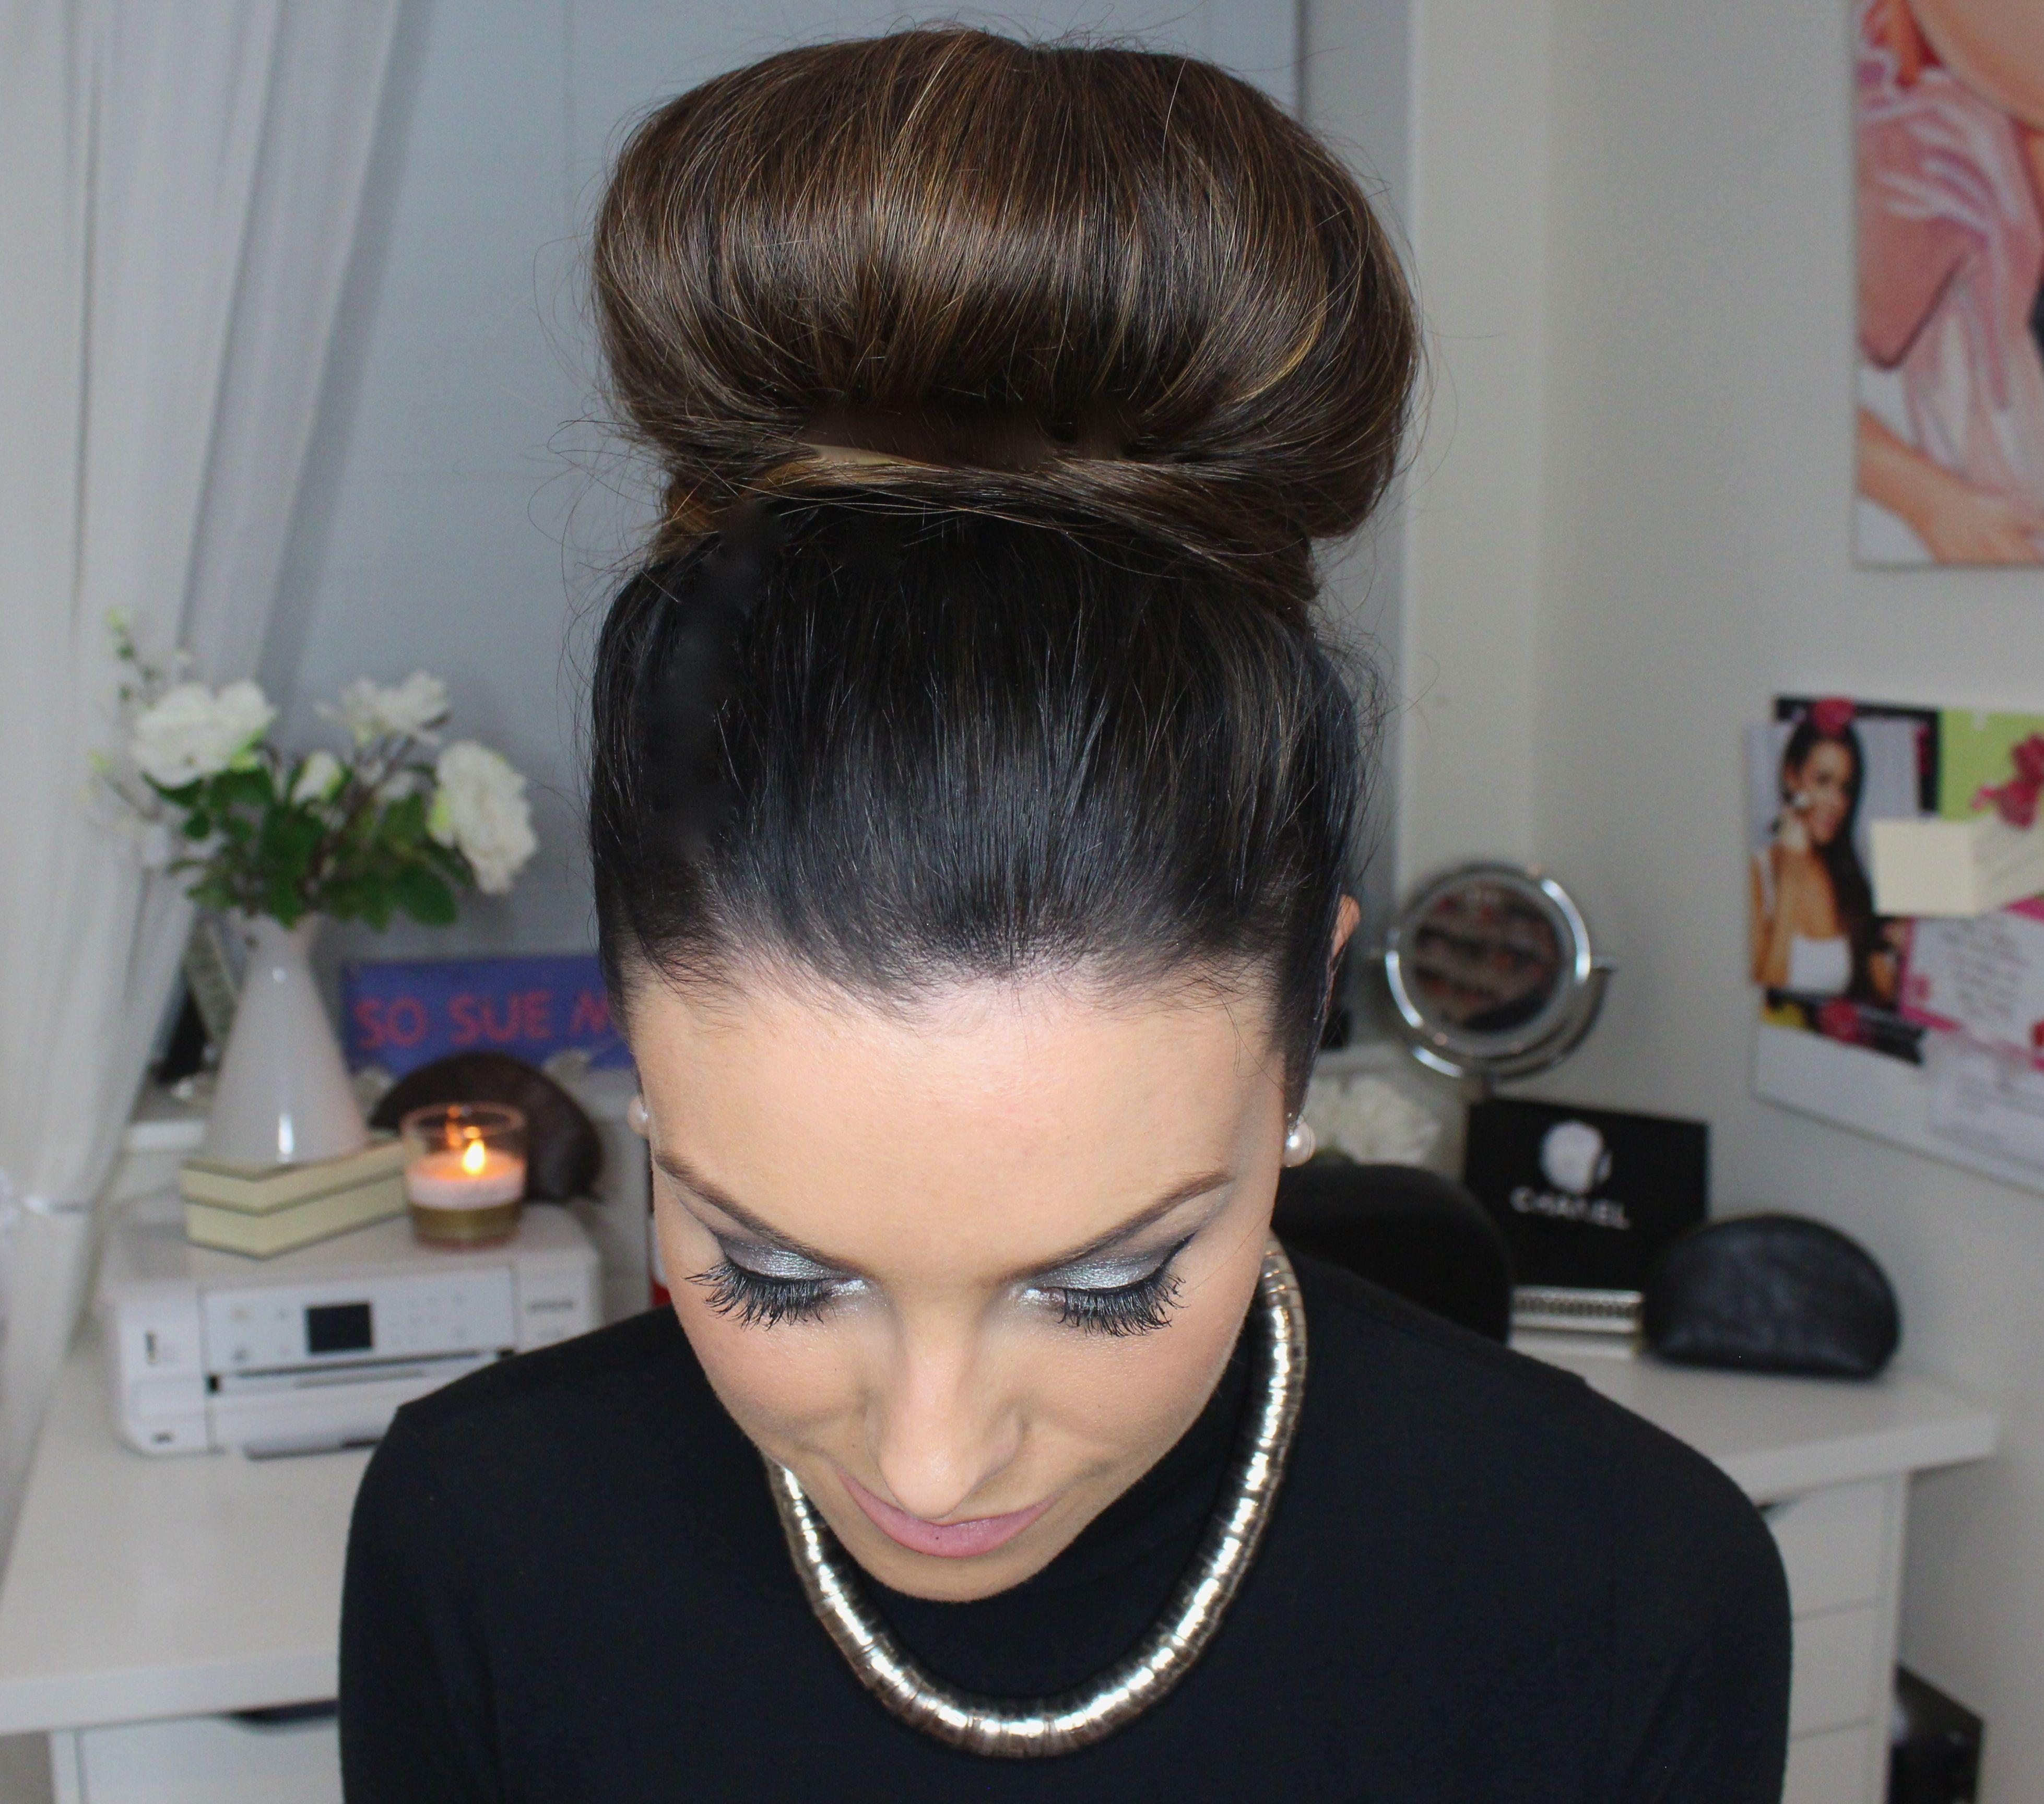 Watch How To 5 Minute Sleek Bun Hair Tutorial So Sue Me